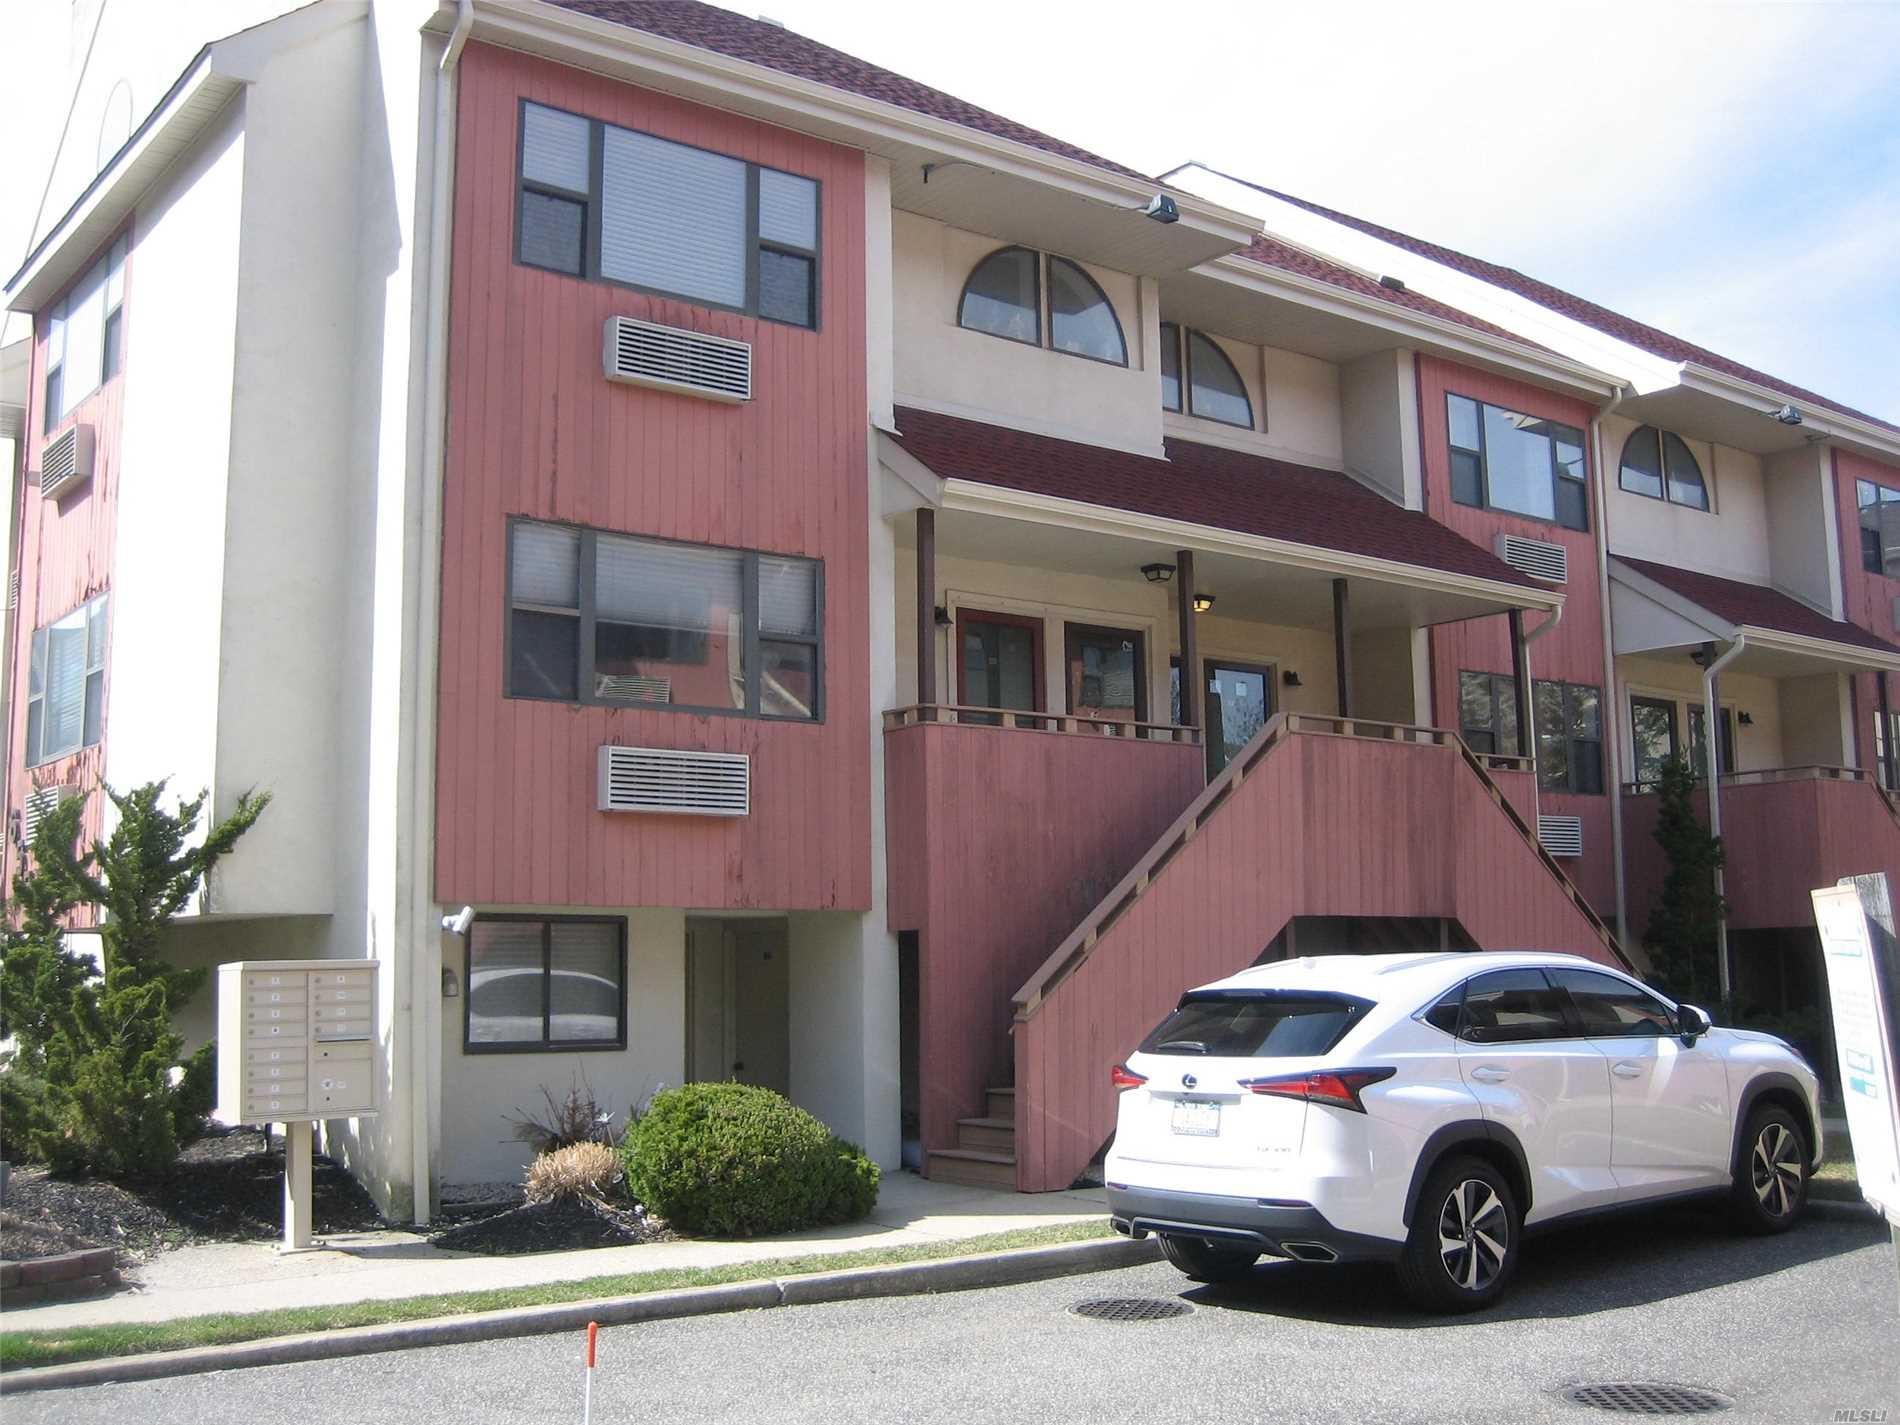 Property for sale at 655 Shore Road # B, Long Beach NY 11561, Long Beach,  New York 11561